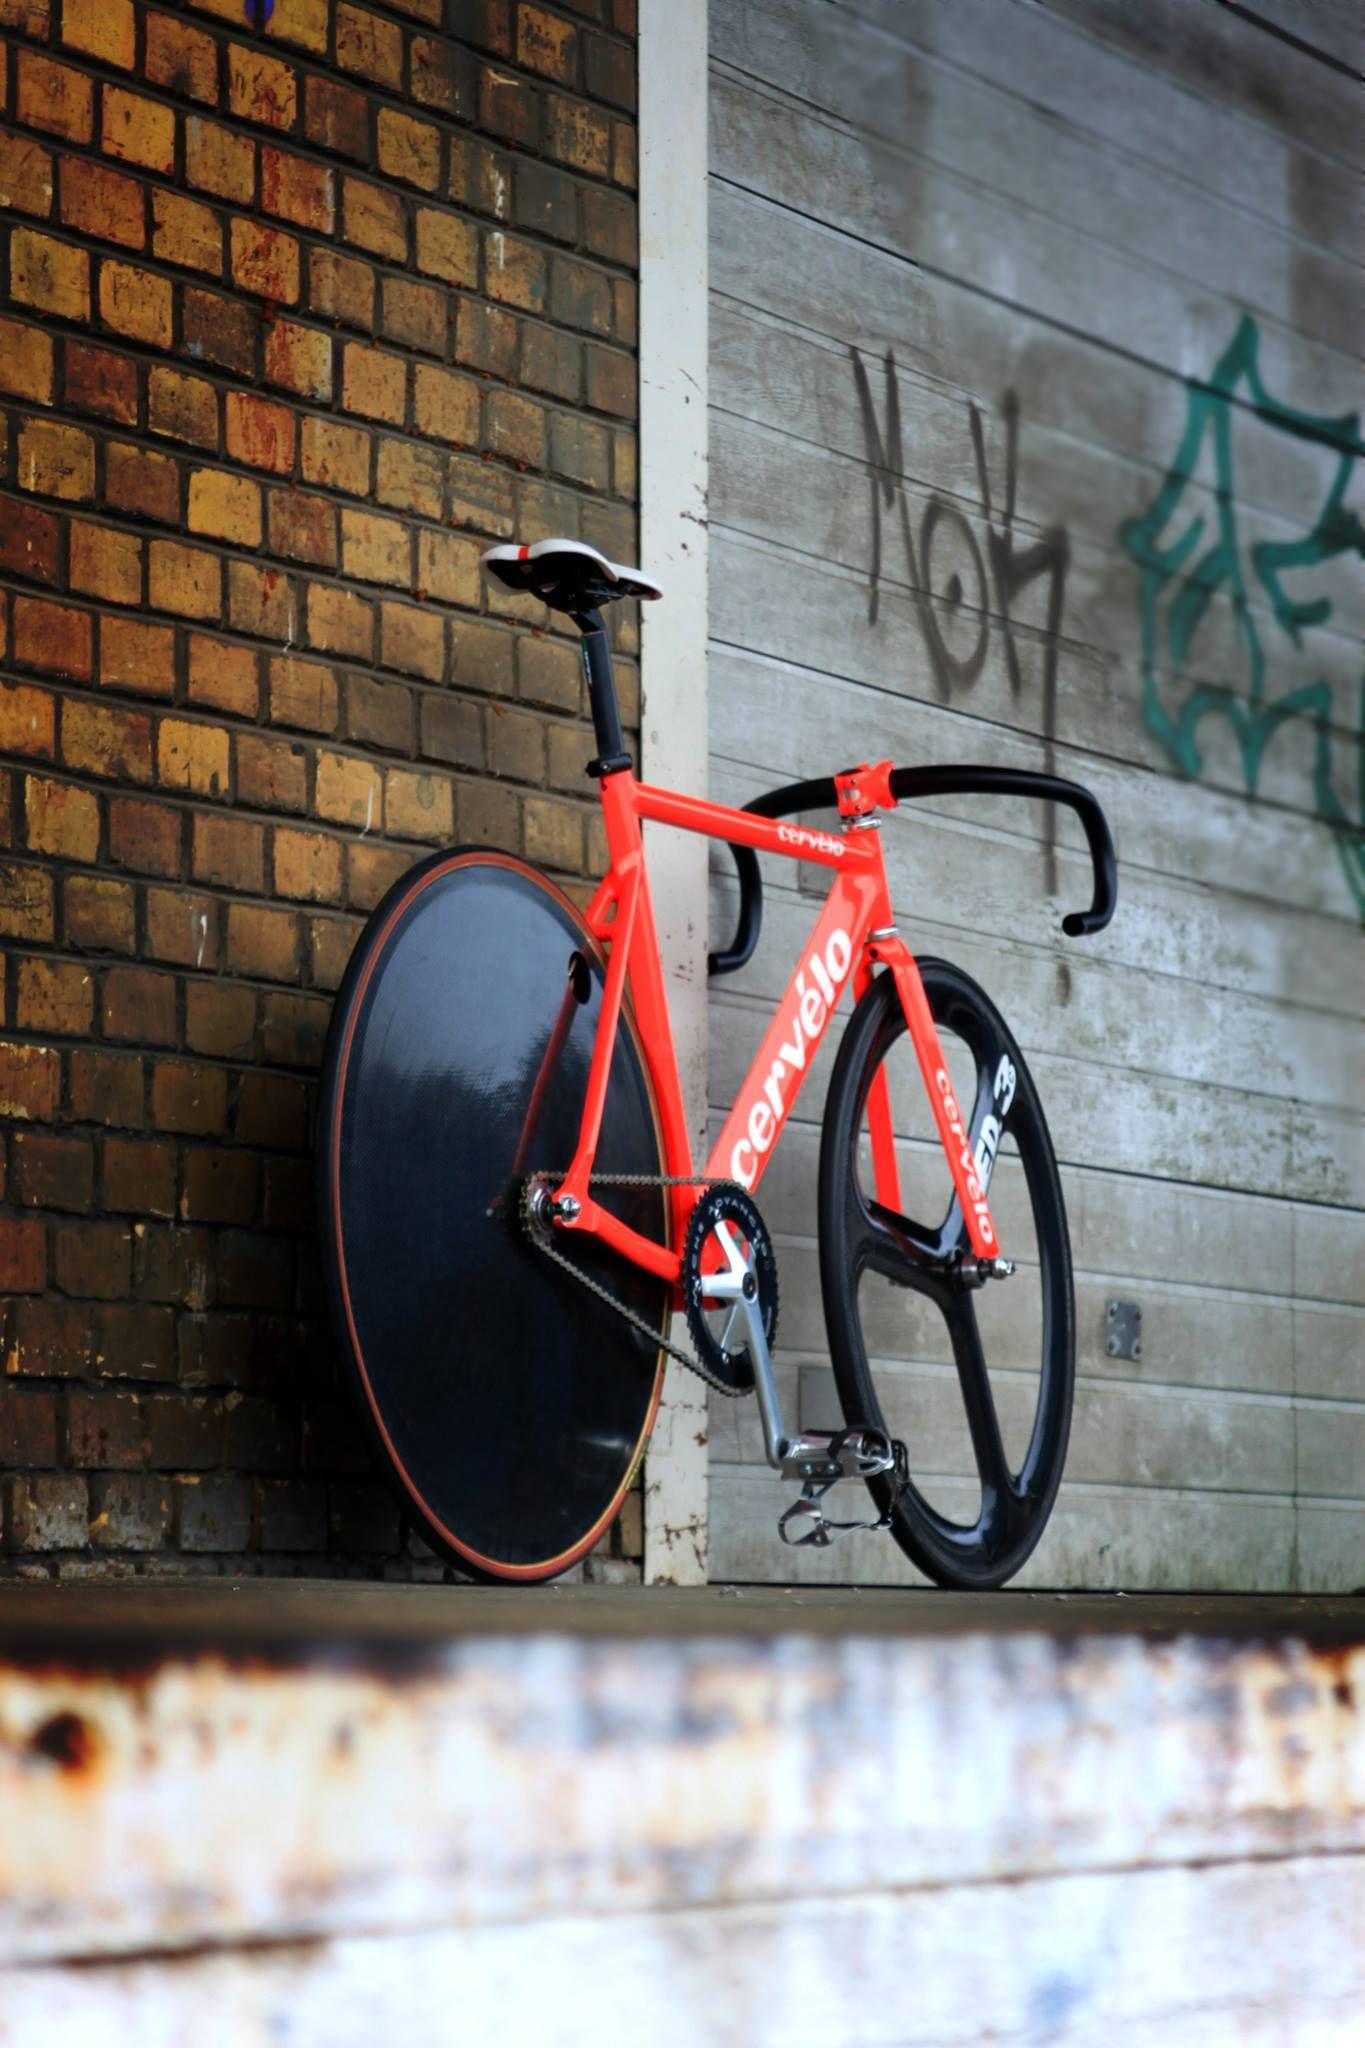 Fixed Gear Speed Bike Fixed Gear Bike Fixed Bike